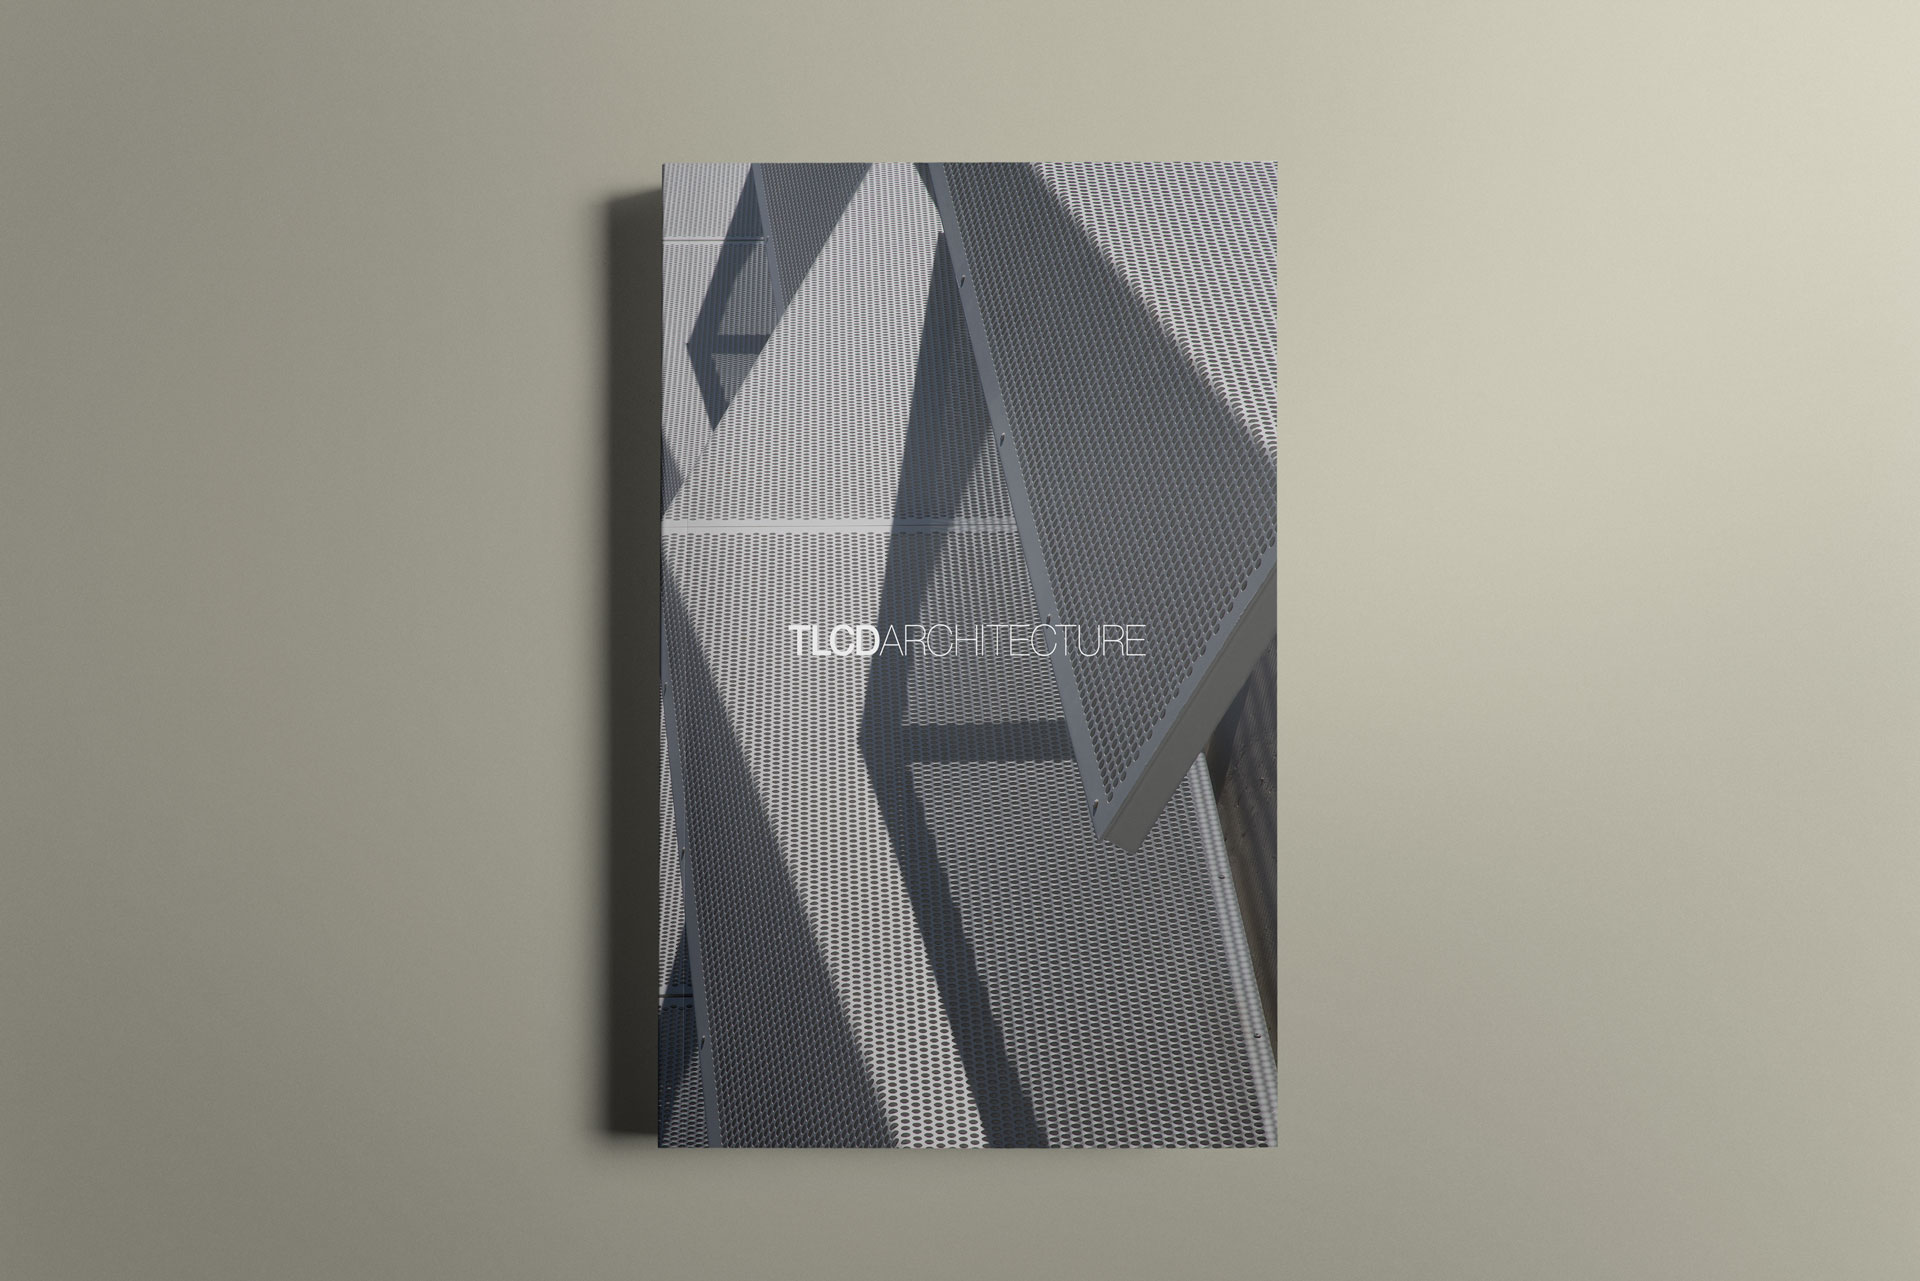 TLCD-brochure_cover.jpg